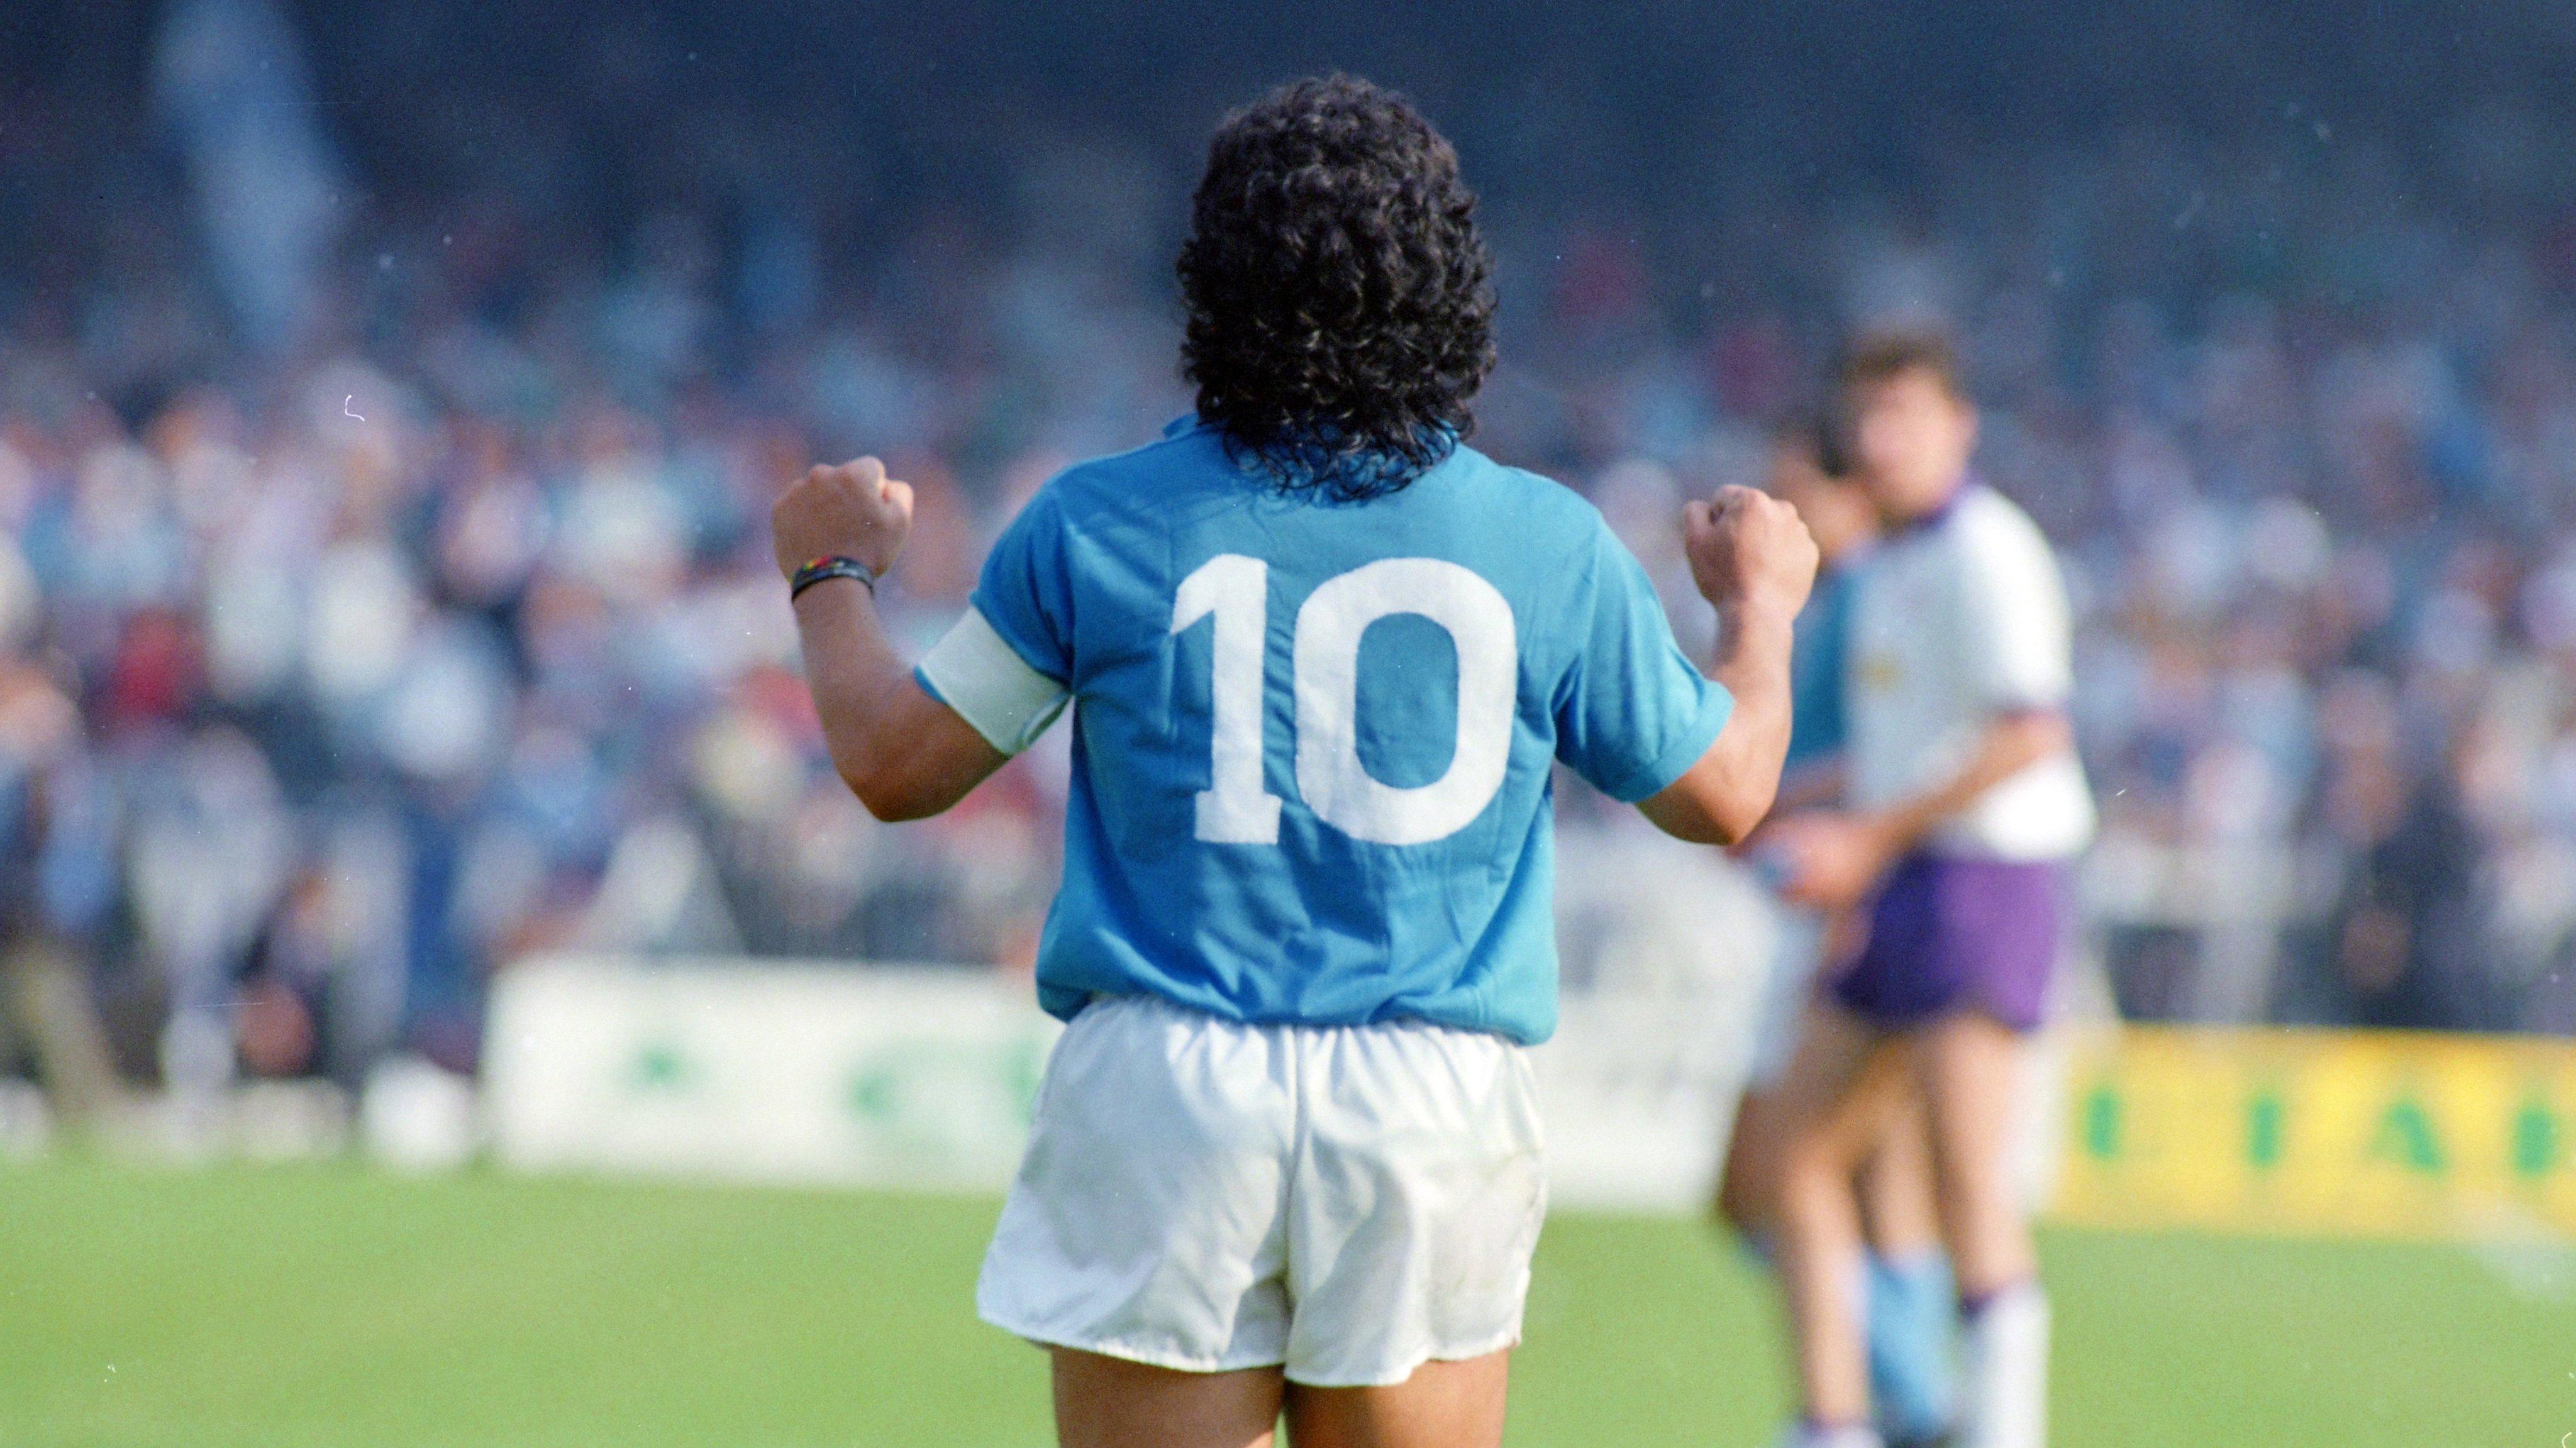 Napoli v Fiorentina - Serie A